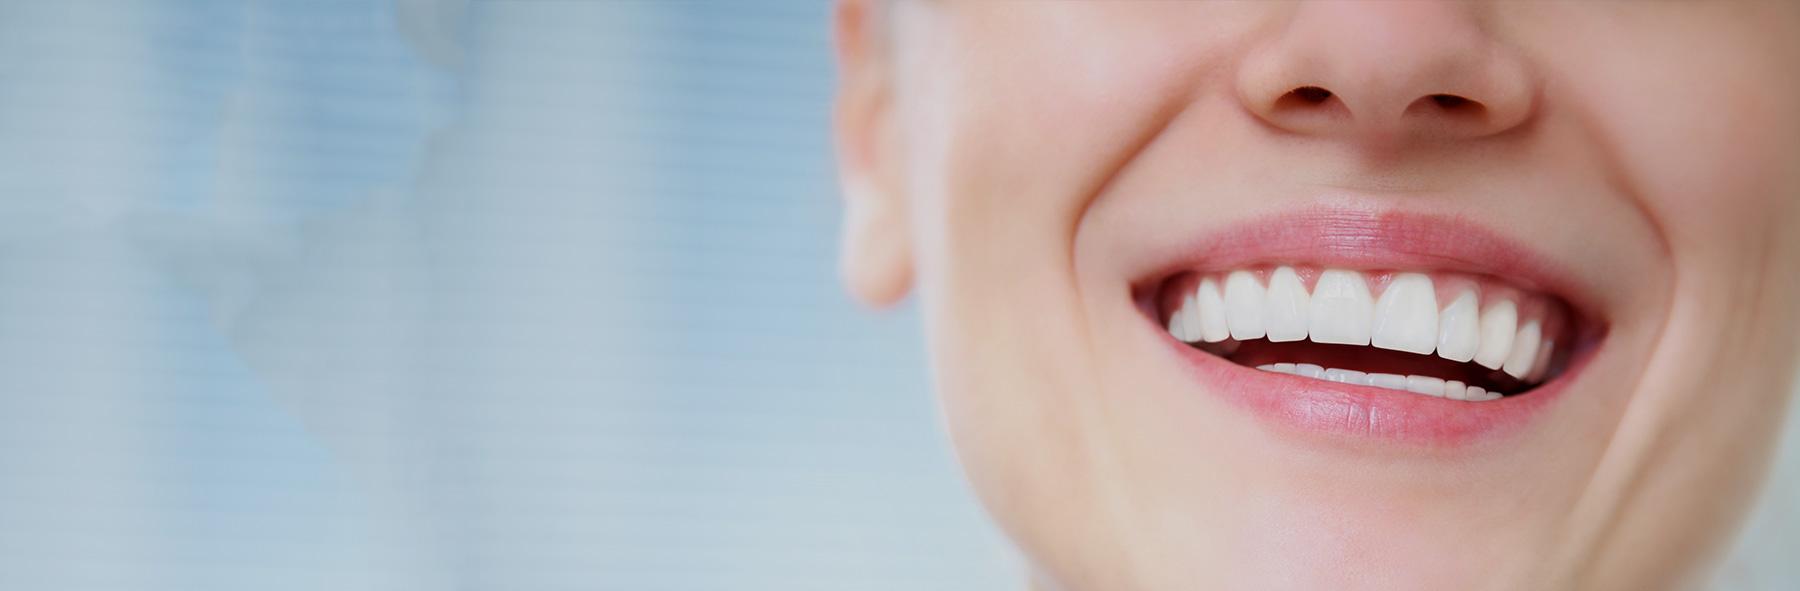 Gum shrinkage (recession)